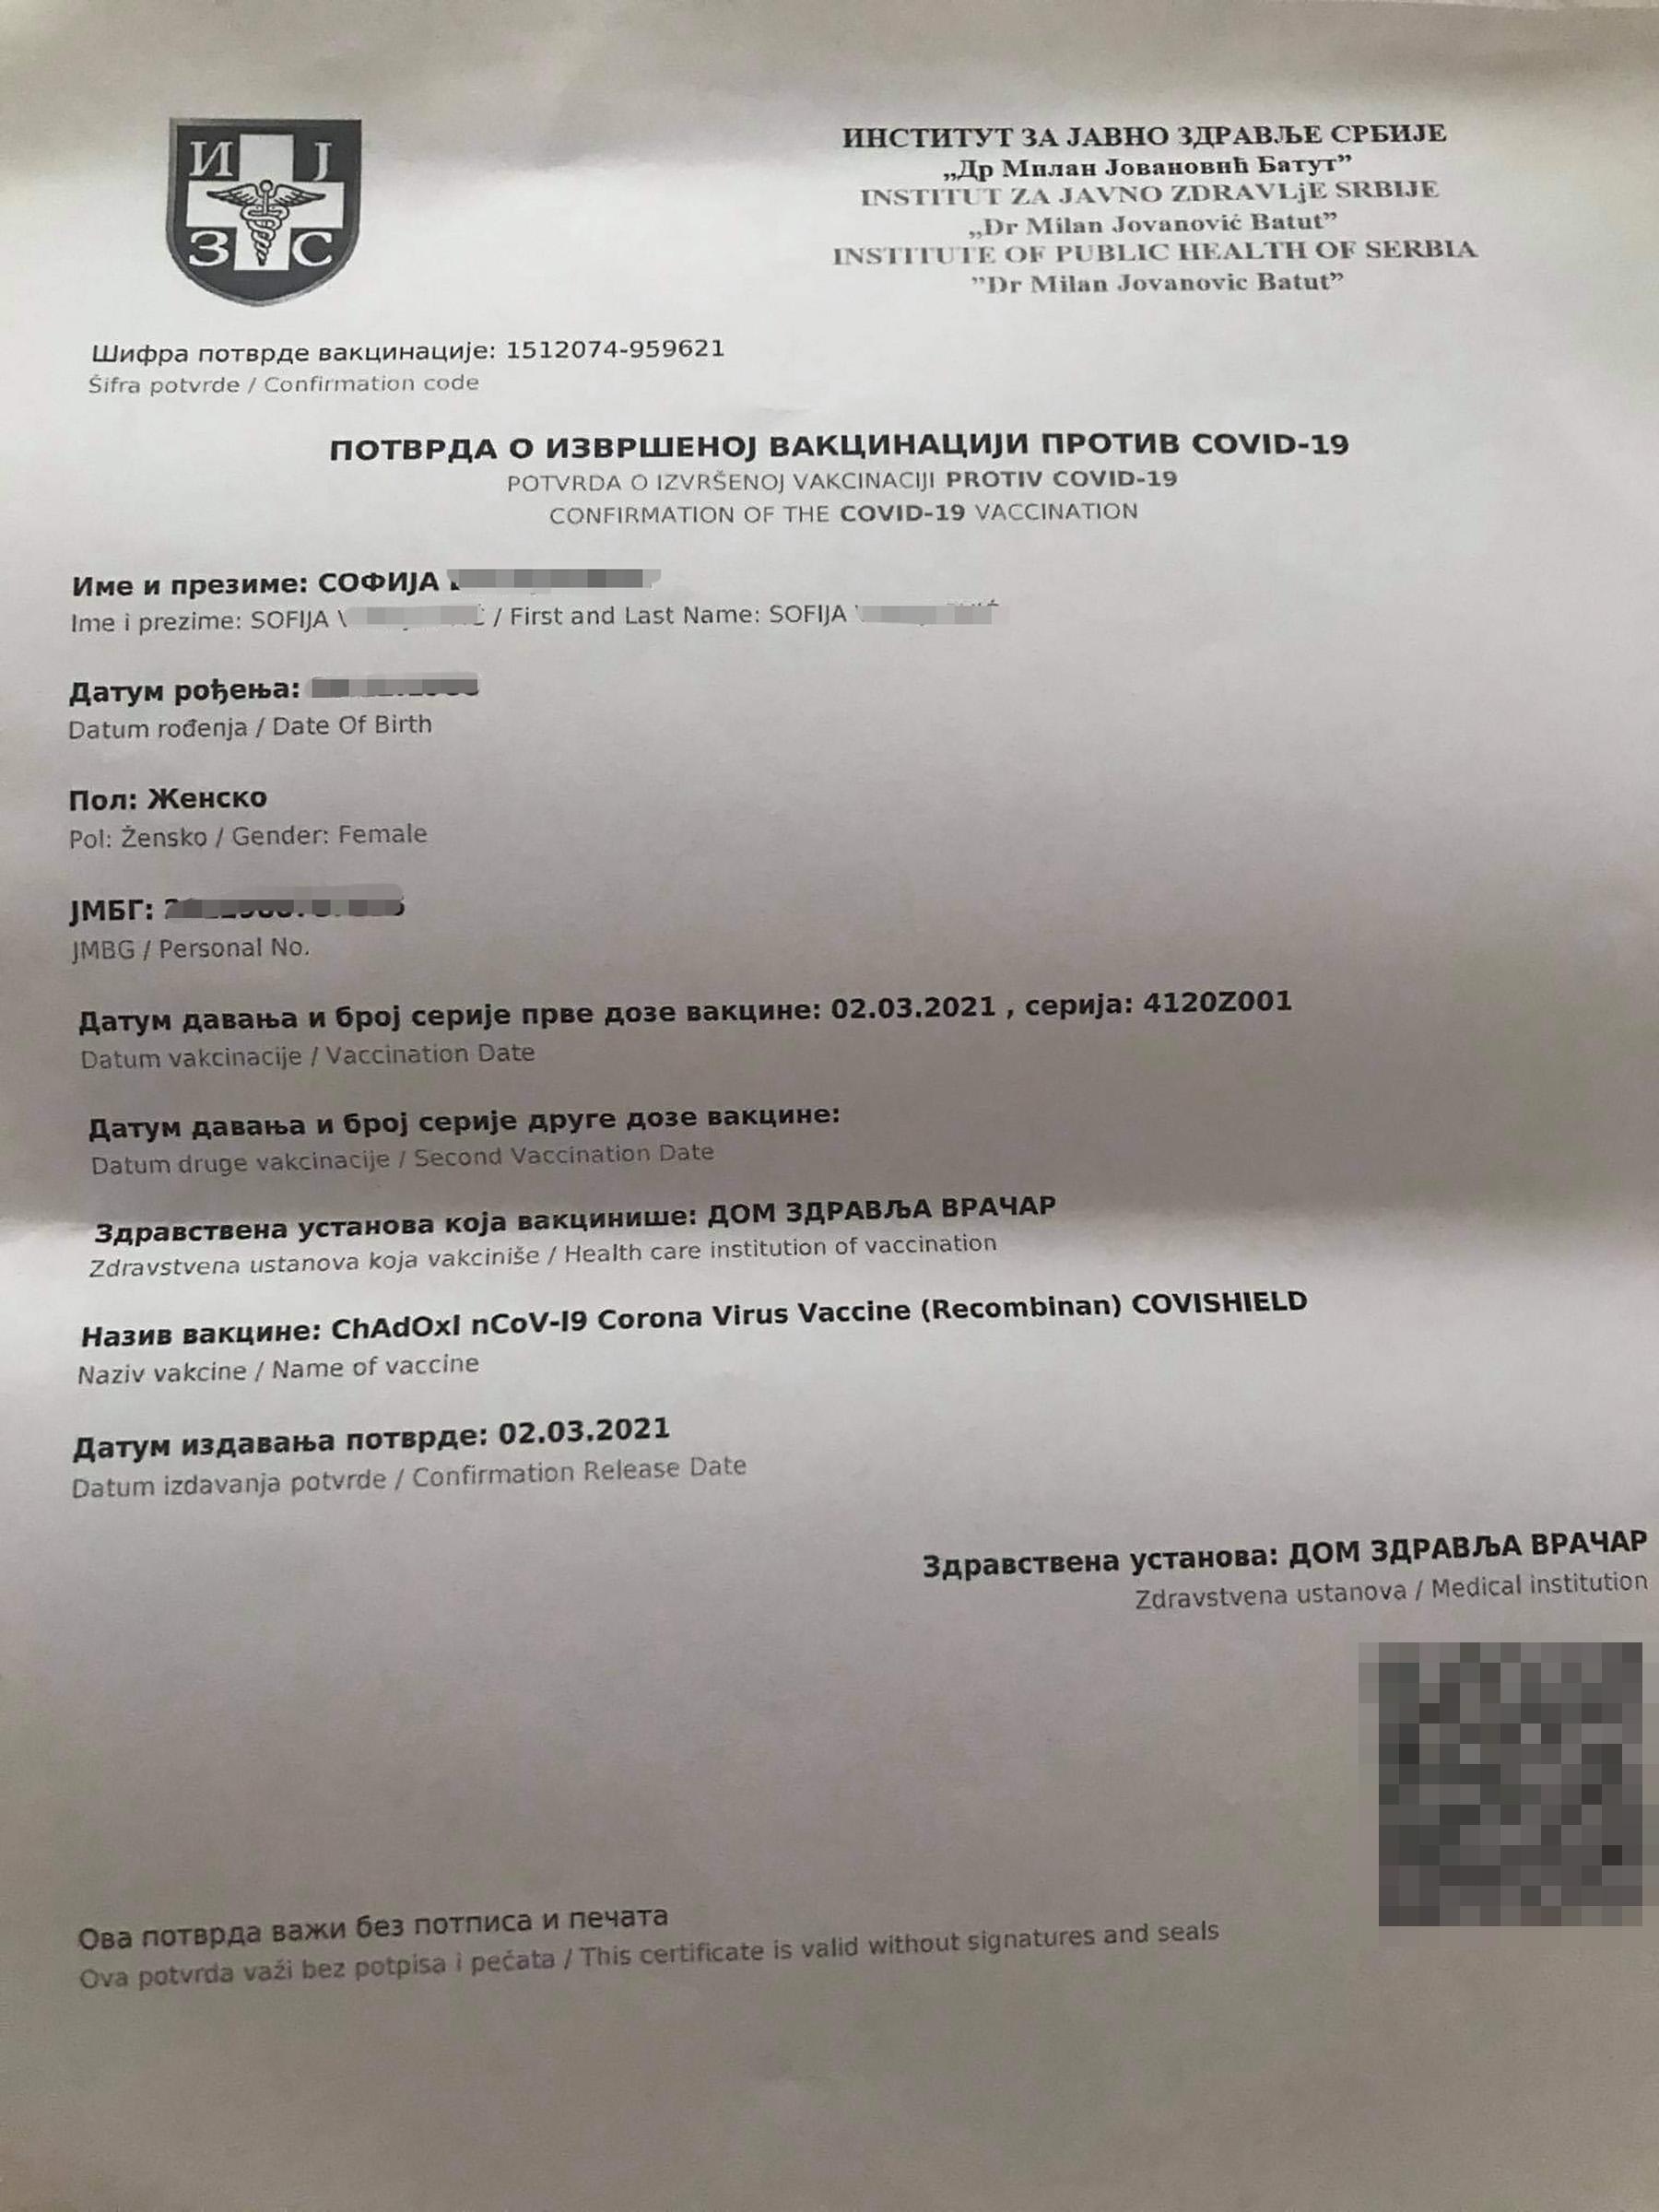 Potvrda o izvršenoj vakcinaciji protiv COVID-19